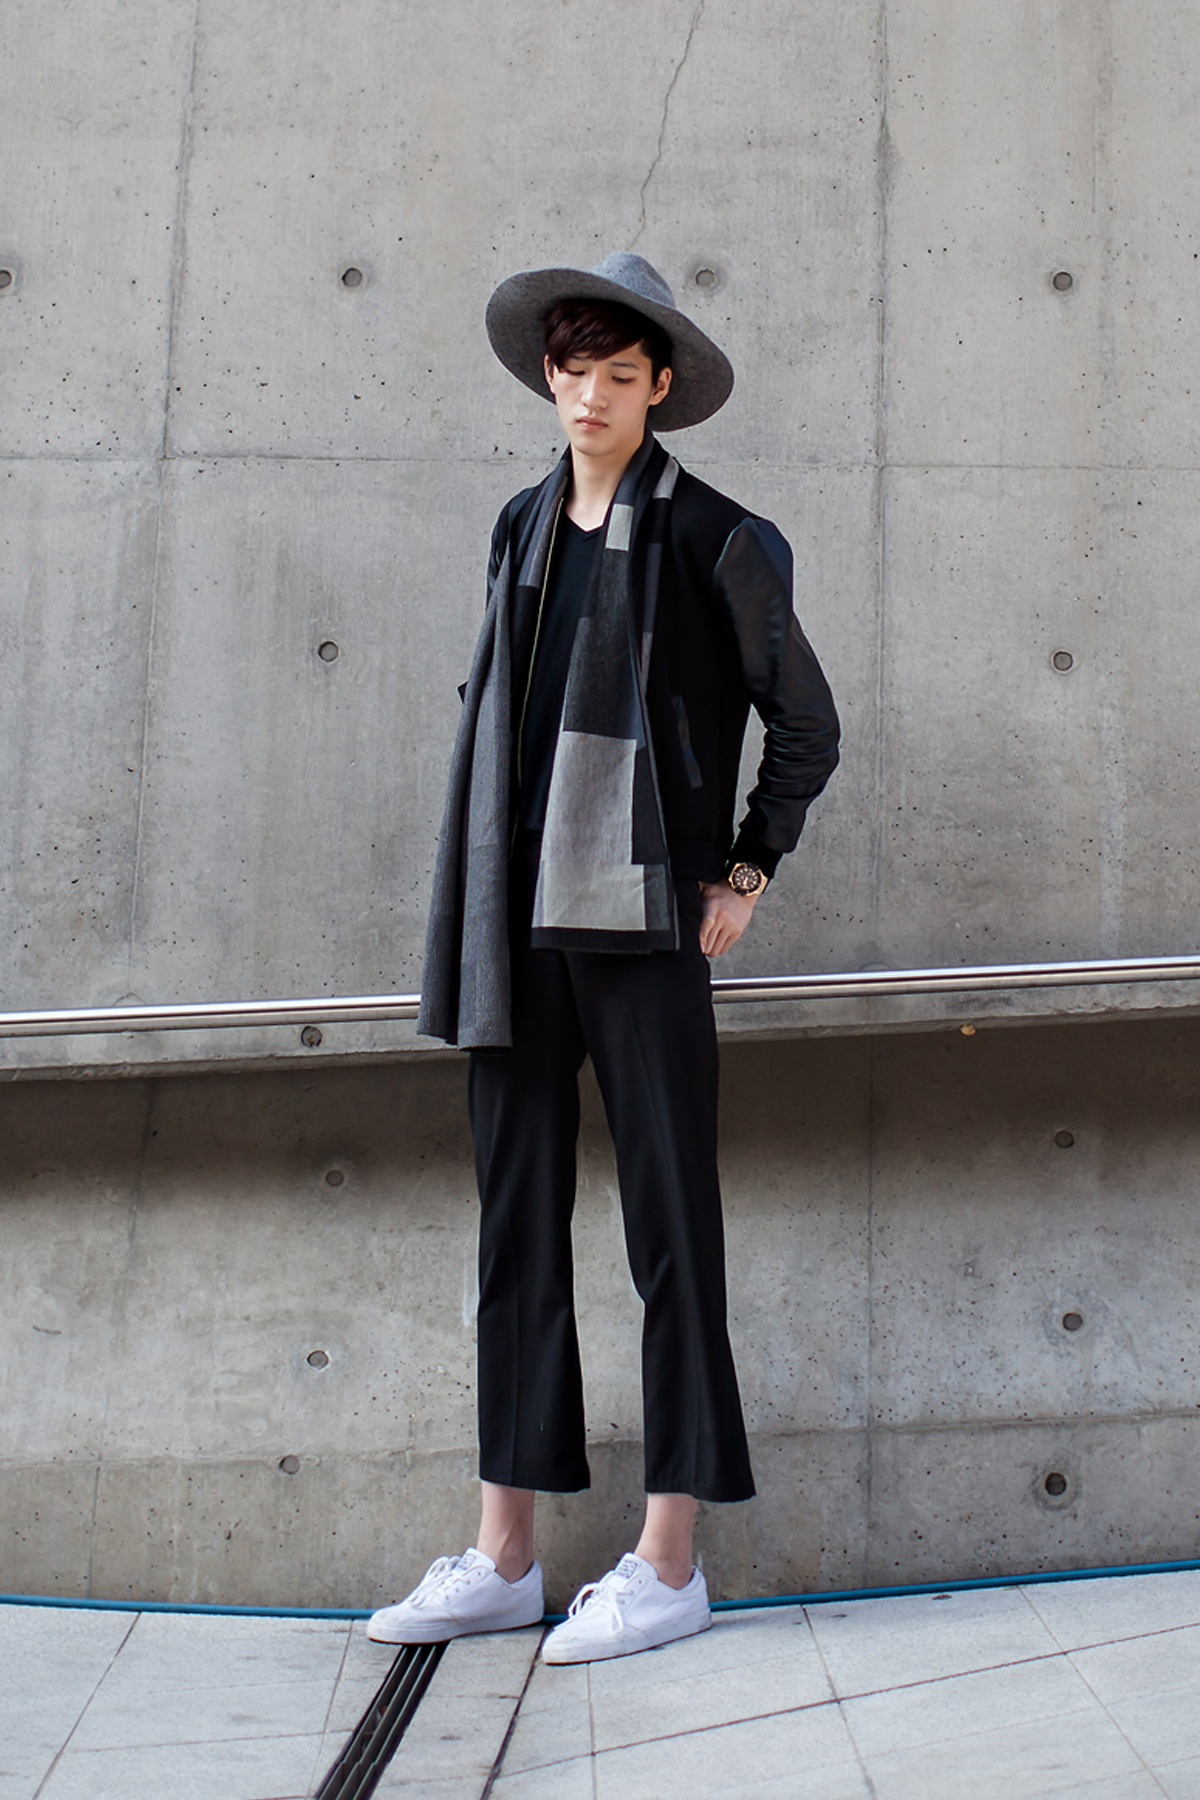 On the street… Choi Eunseok Seoul fashion week 2016 SS